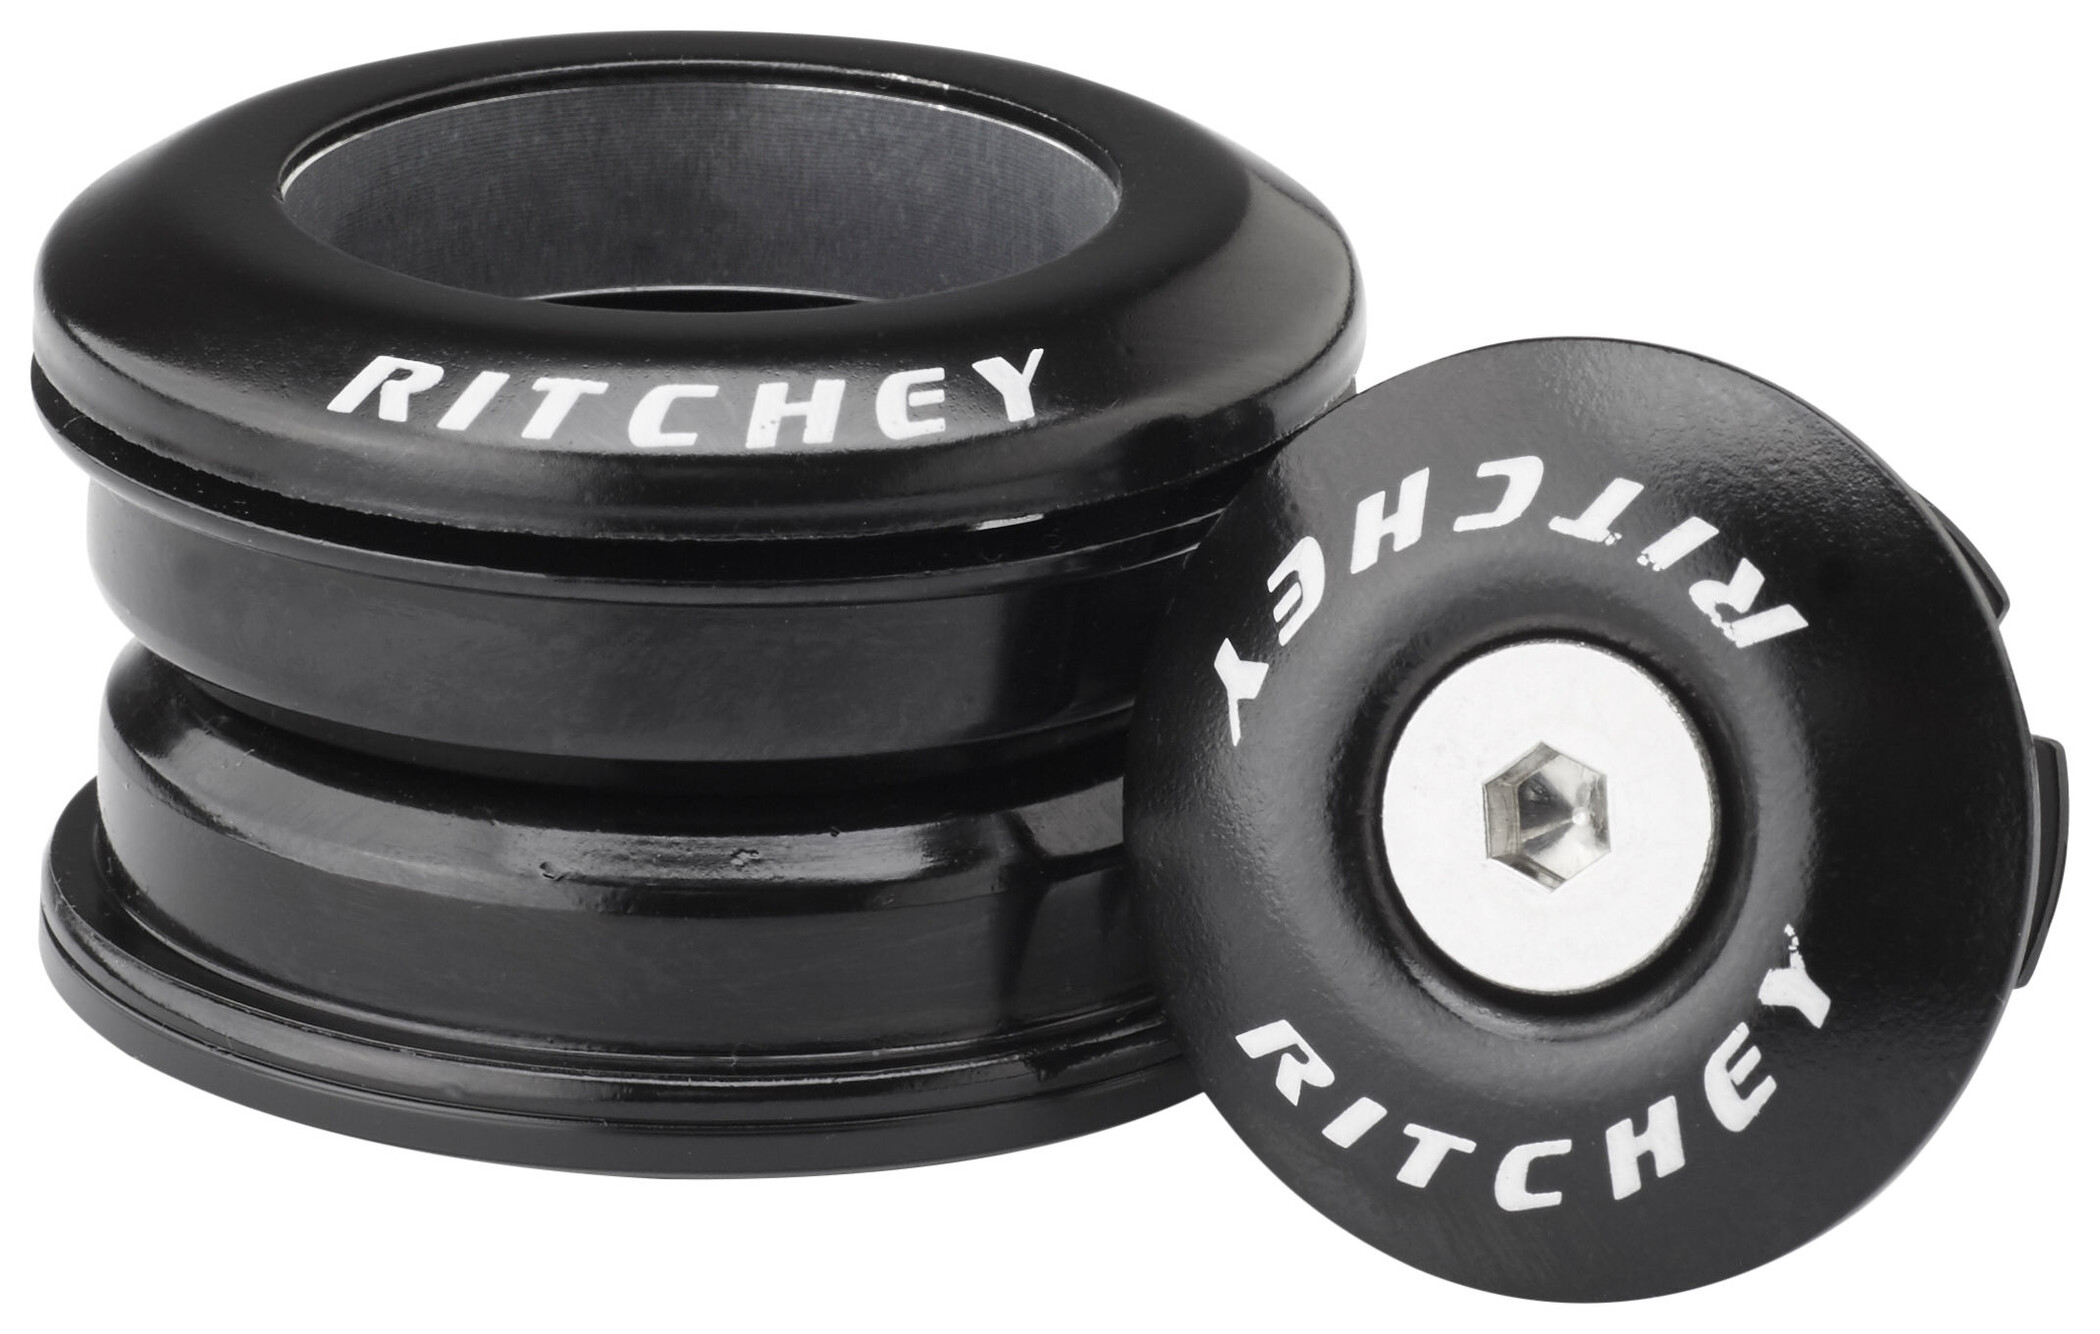 Ritchey Comp Zero Styrfitting ZS44/28.6 I ZS44/30, black (2019) | Headsets